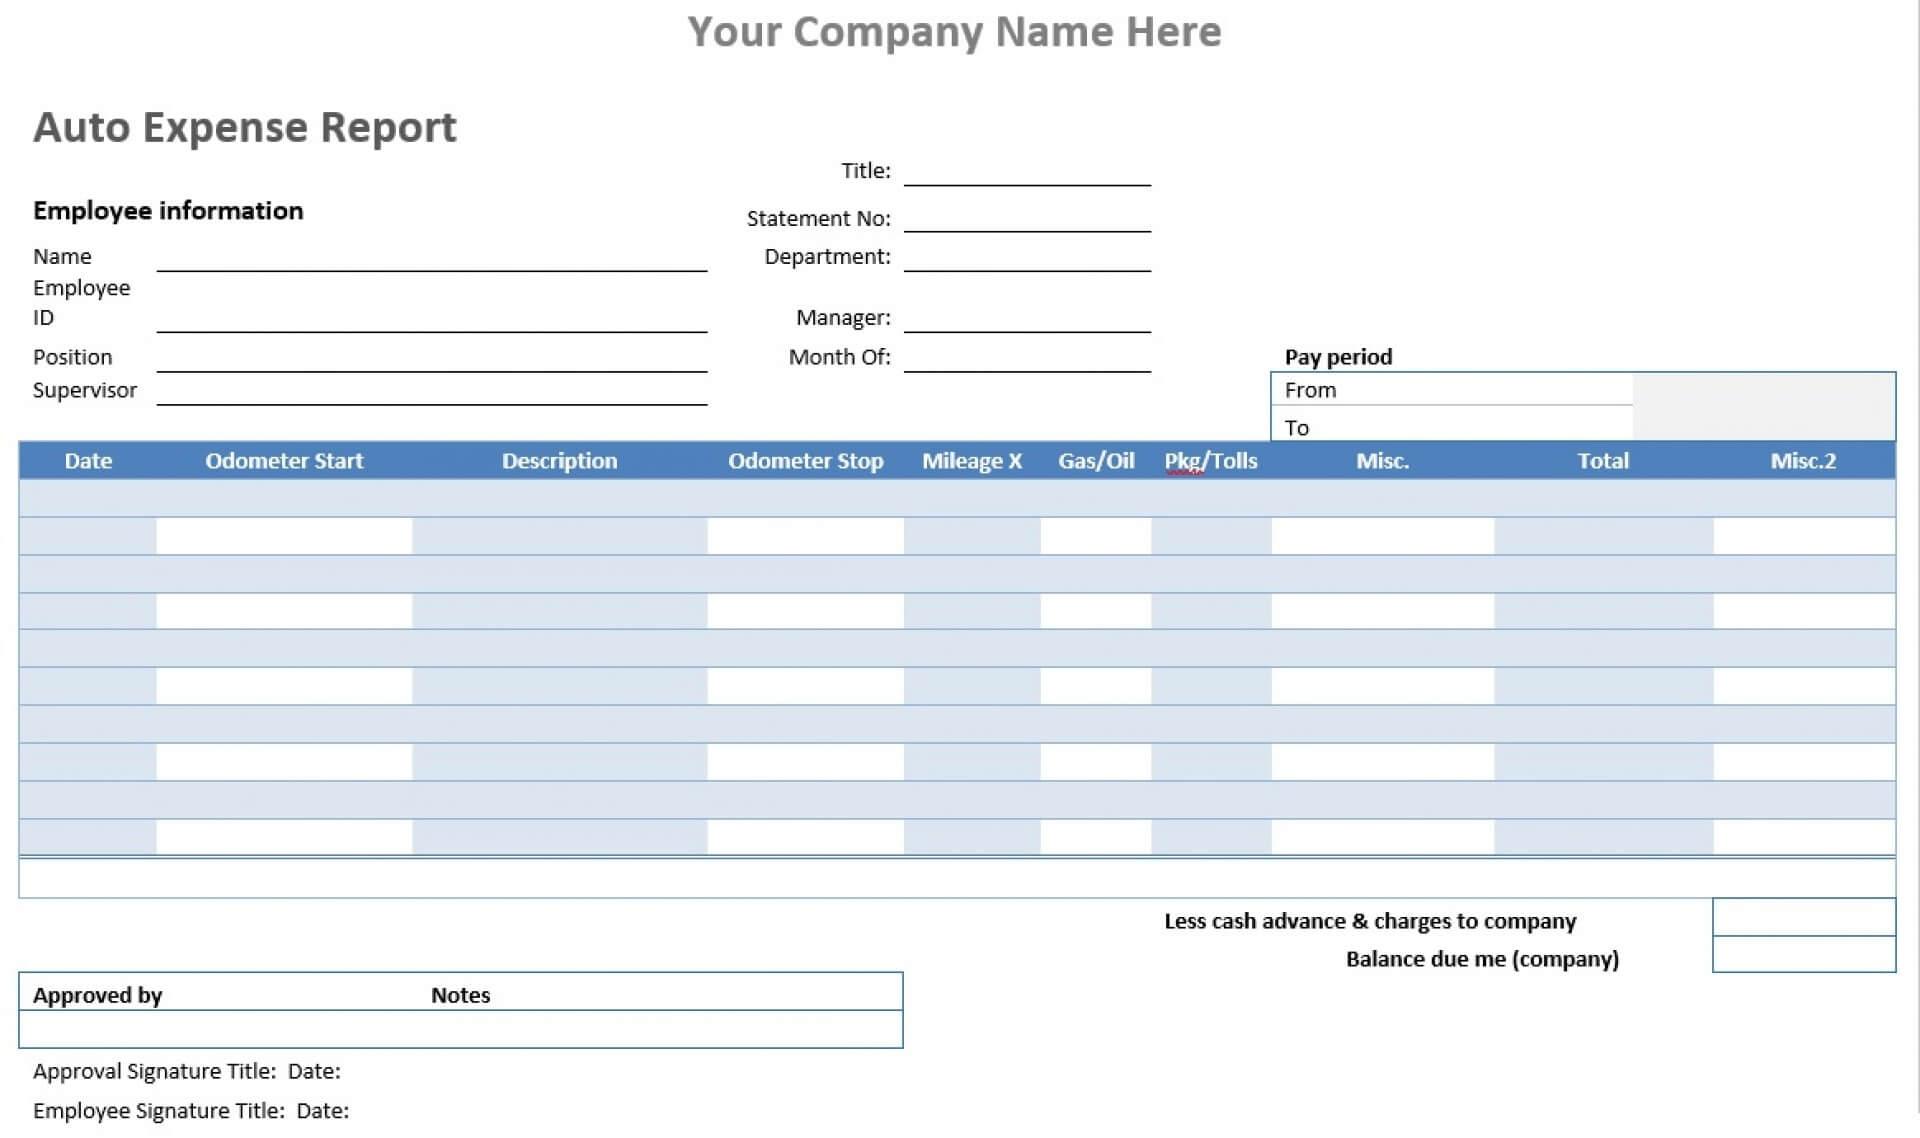 036 Expenses Form Template Lobo Black Mileage Reimbursement With Gas Mileage Expense Report Template